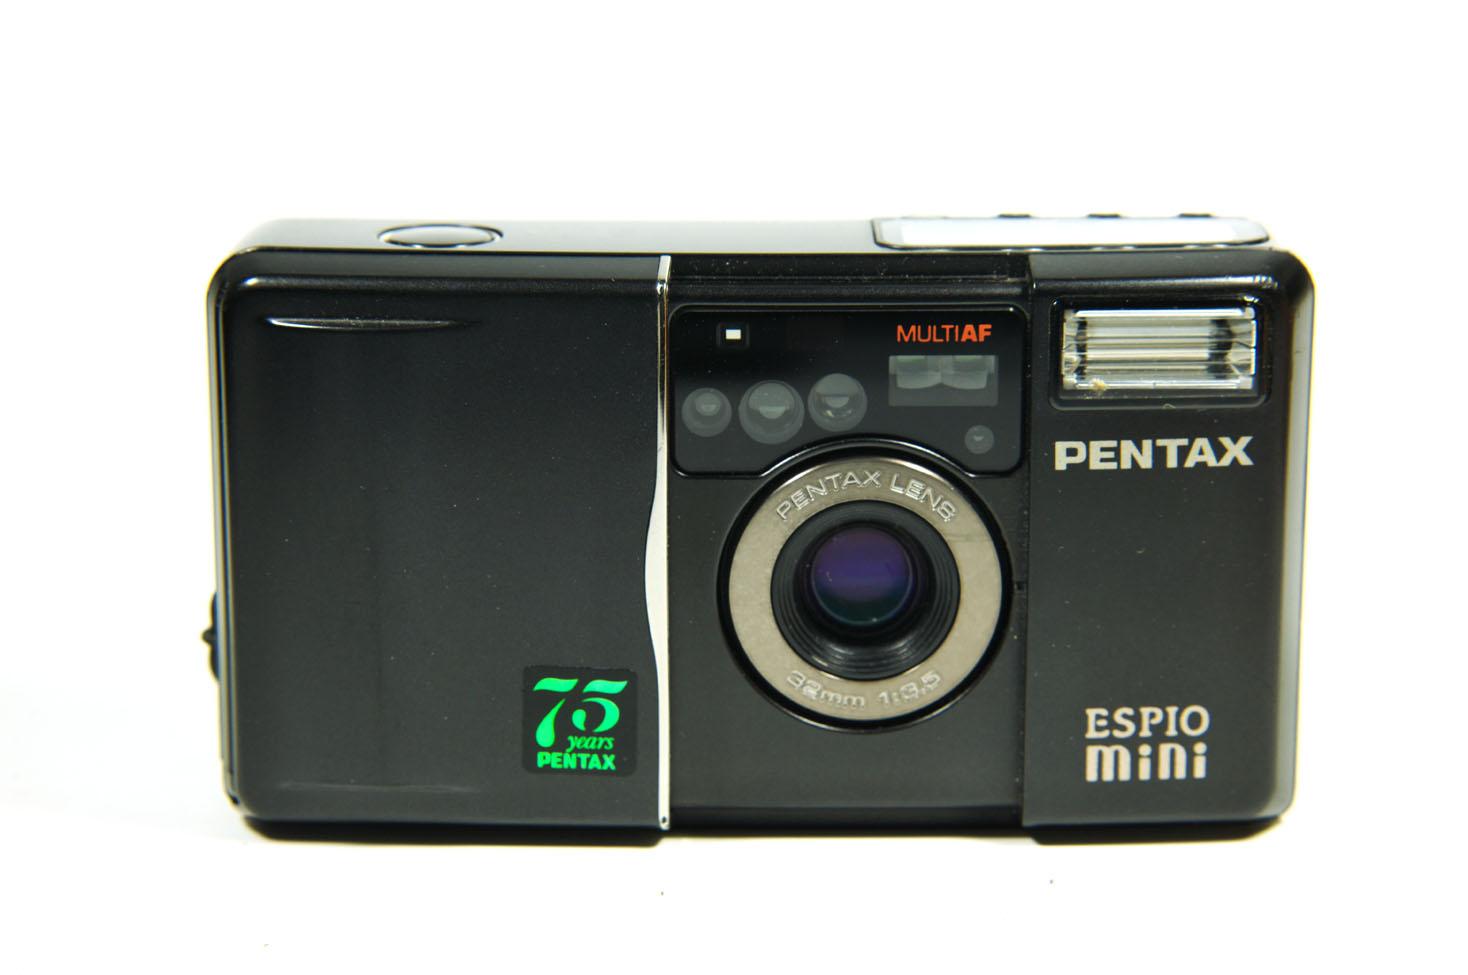 Pentax Spotmatic Sp Ii 35mm Film Camera With Takumar 55mm F/1.8 Smc Lens Analogkameras Analoge Fotografie